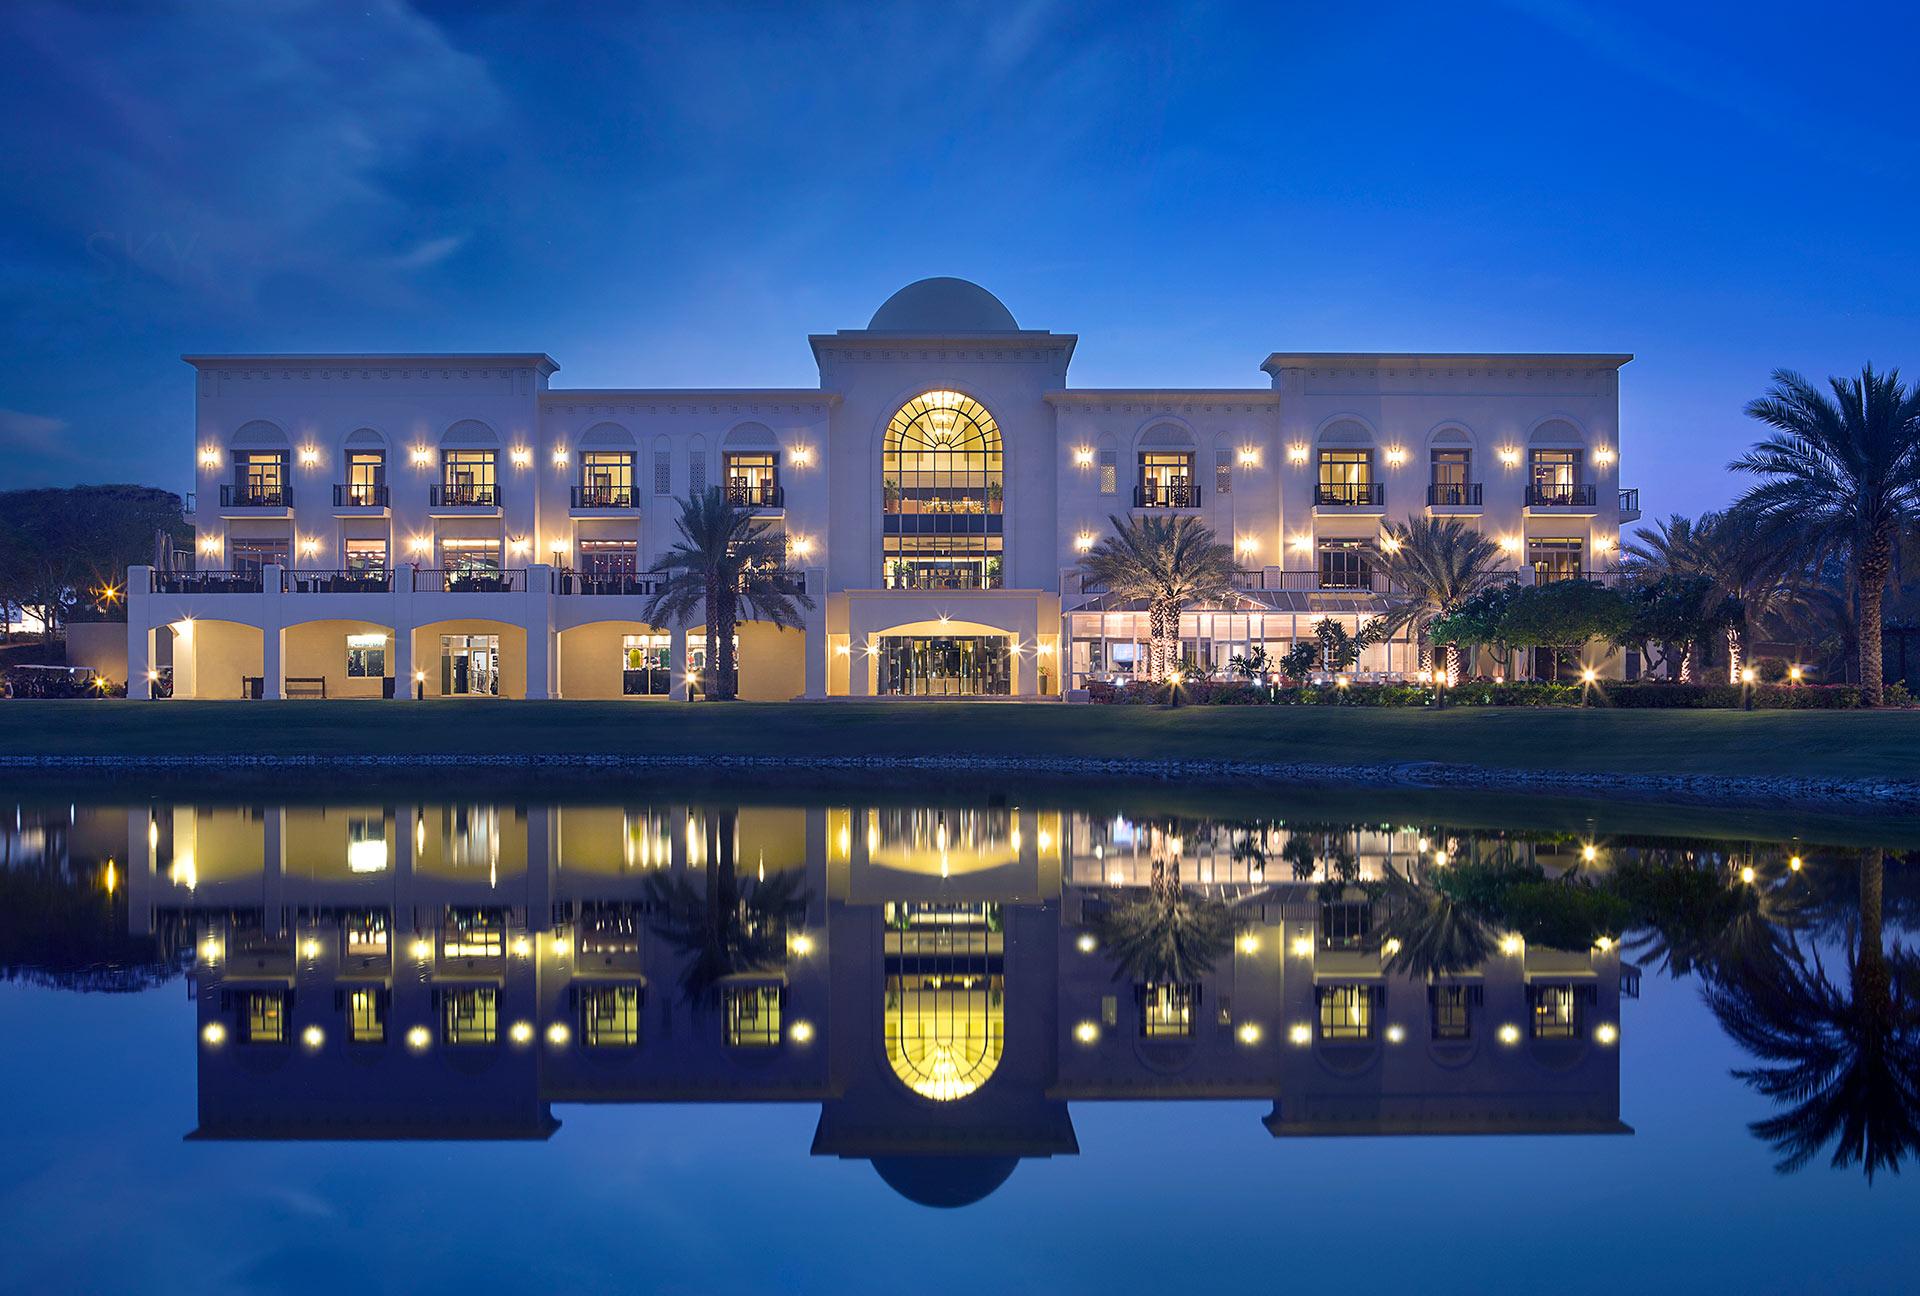 hotel_resort_photography28